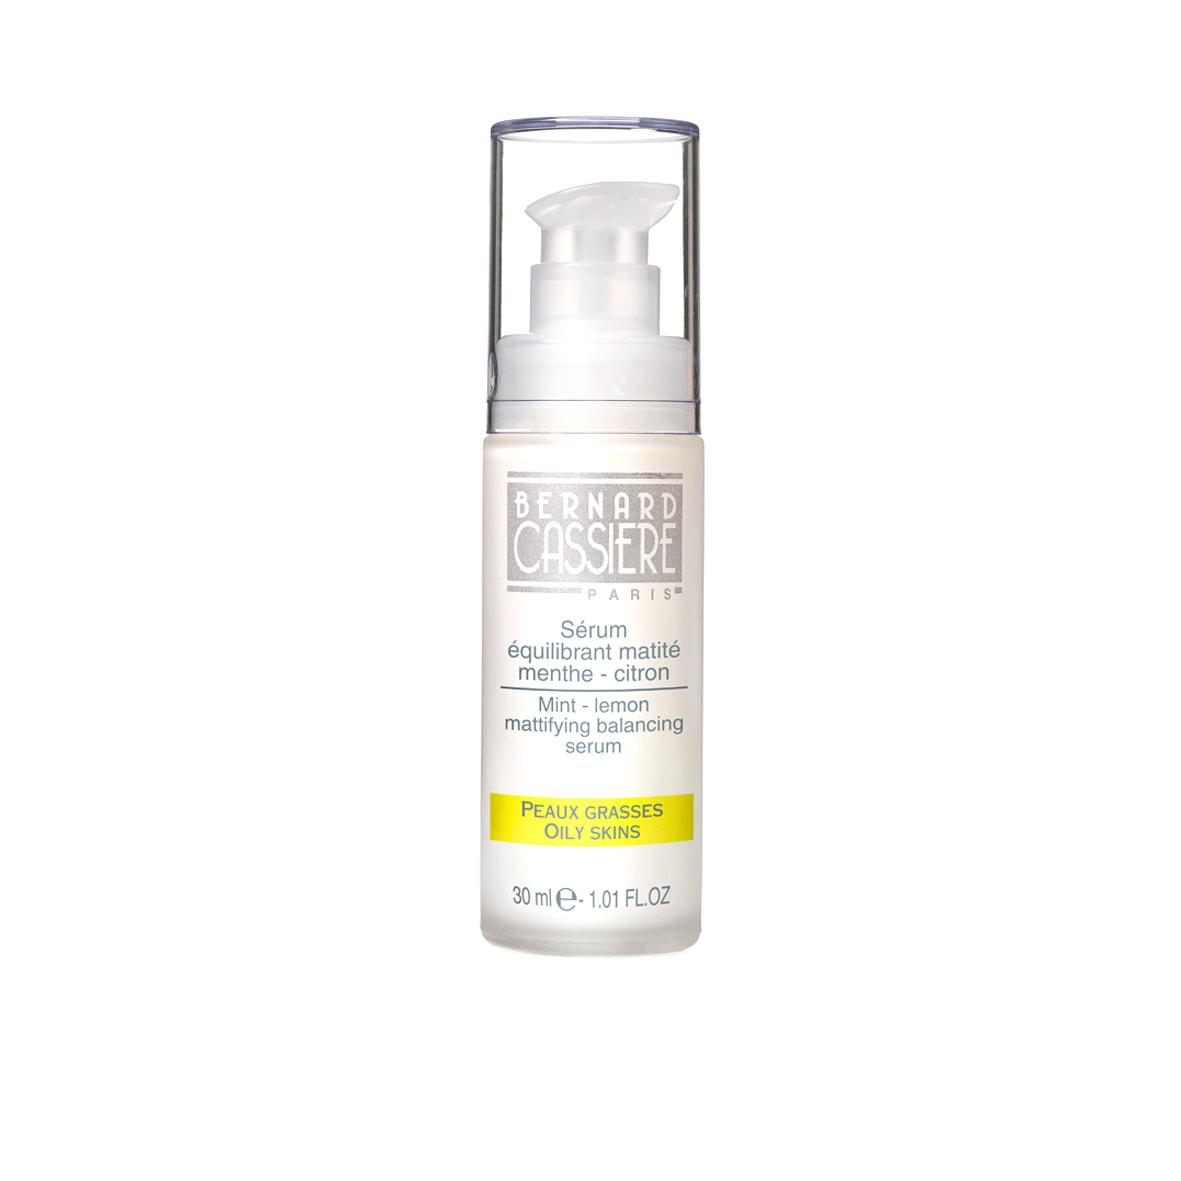 水油平衡精華液│Mint-Lemon Mattifying Balancing Serum